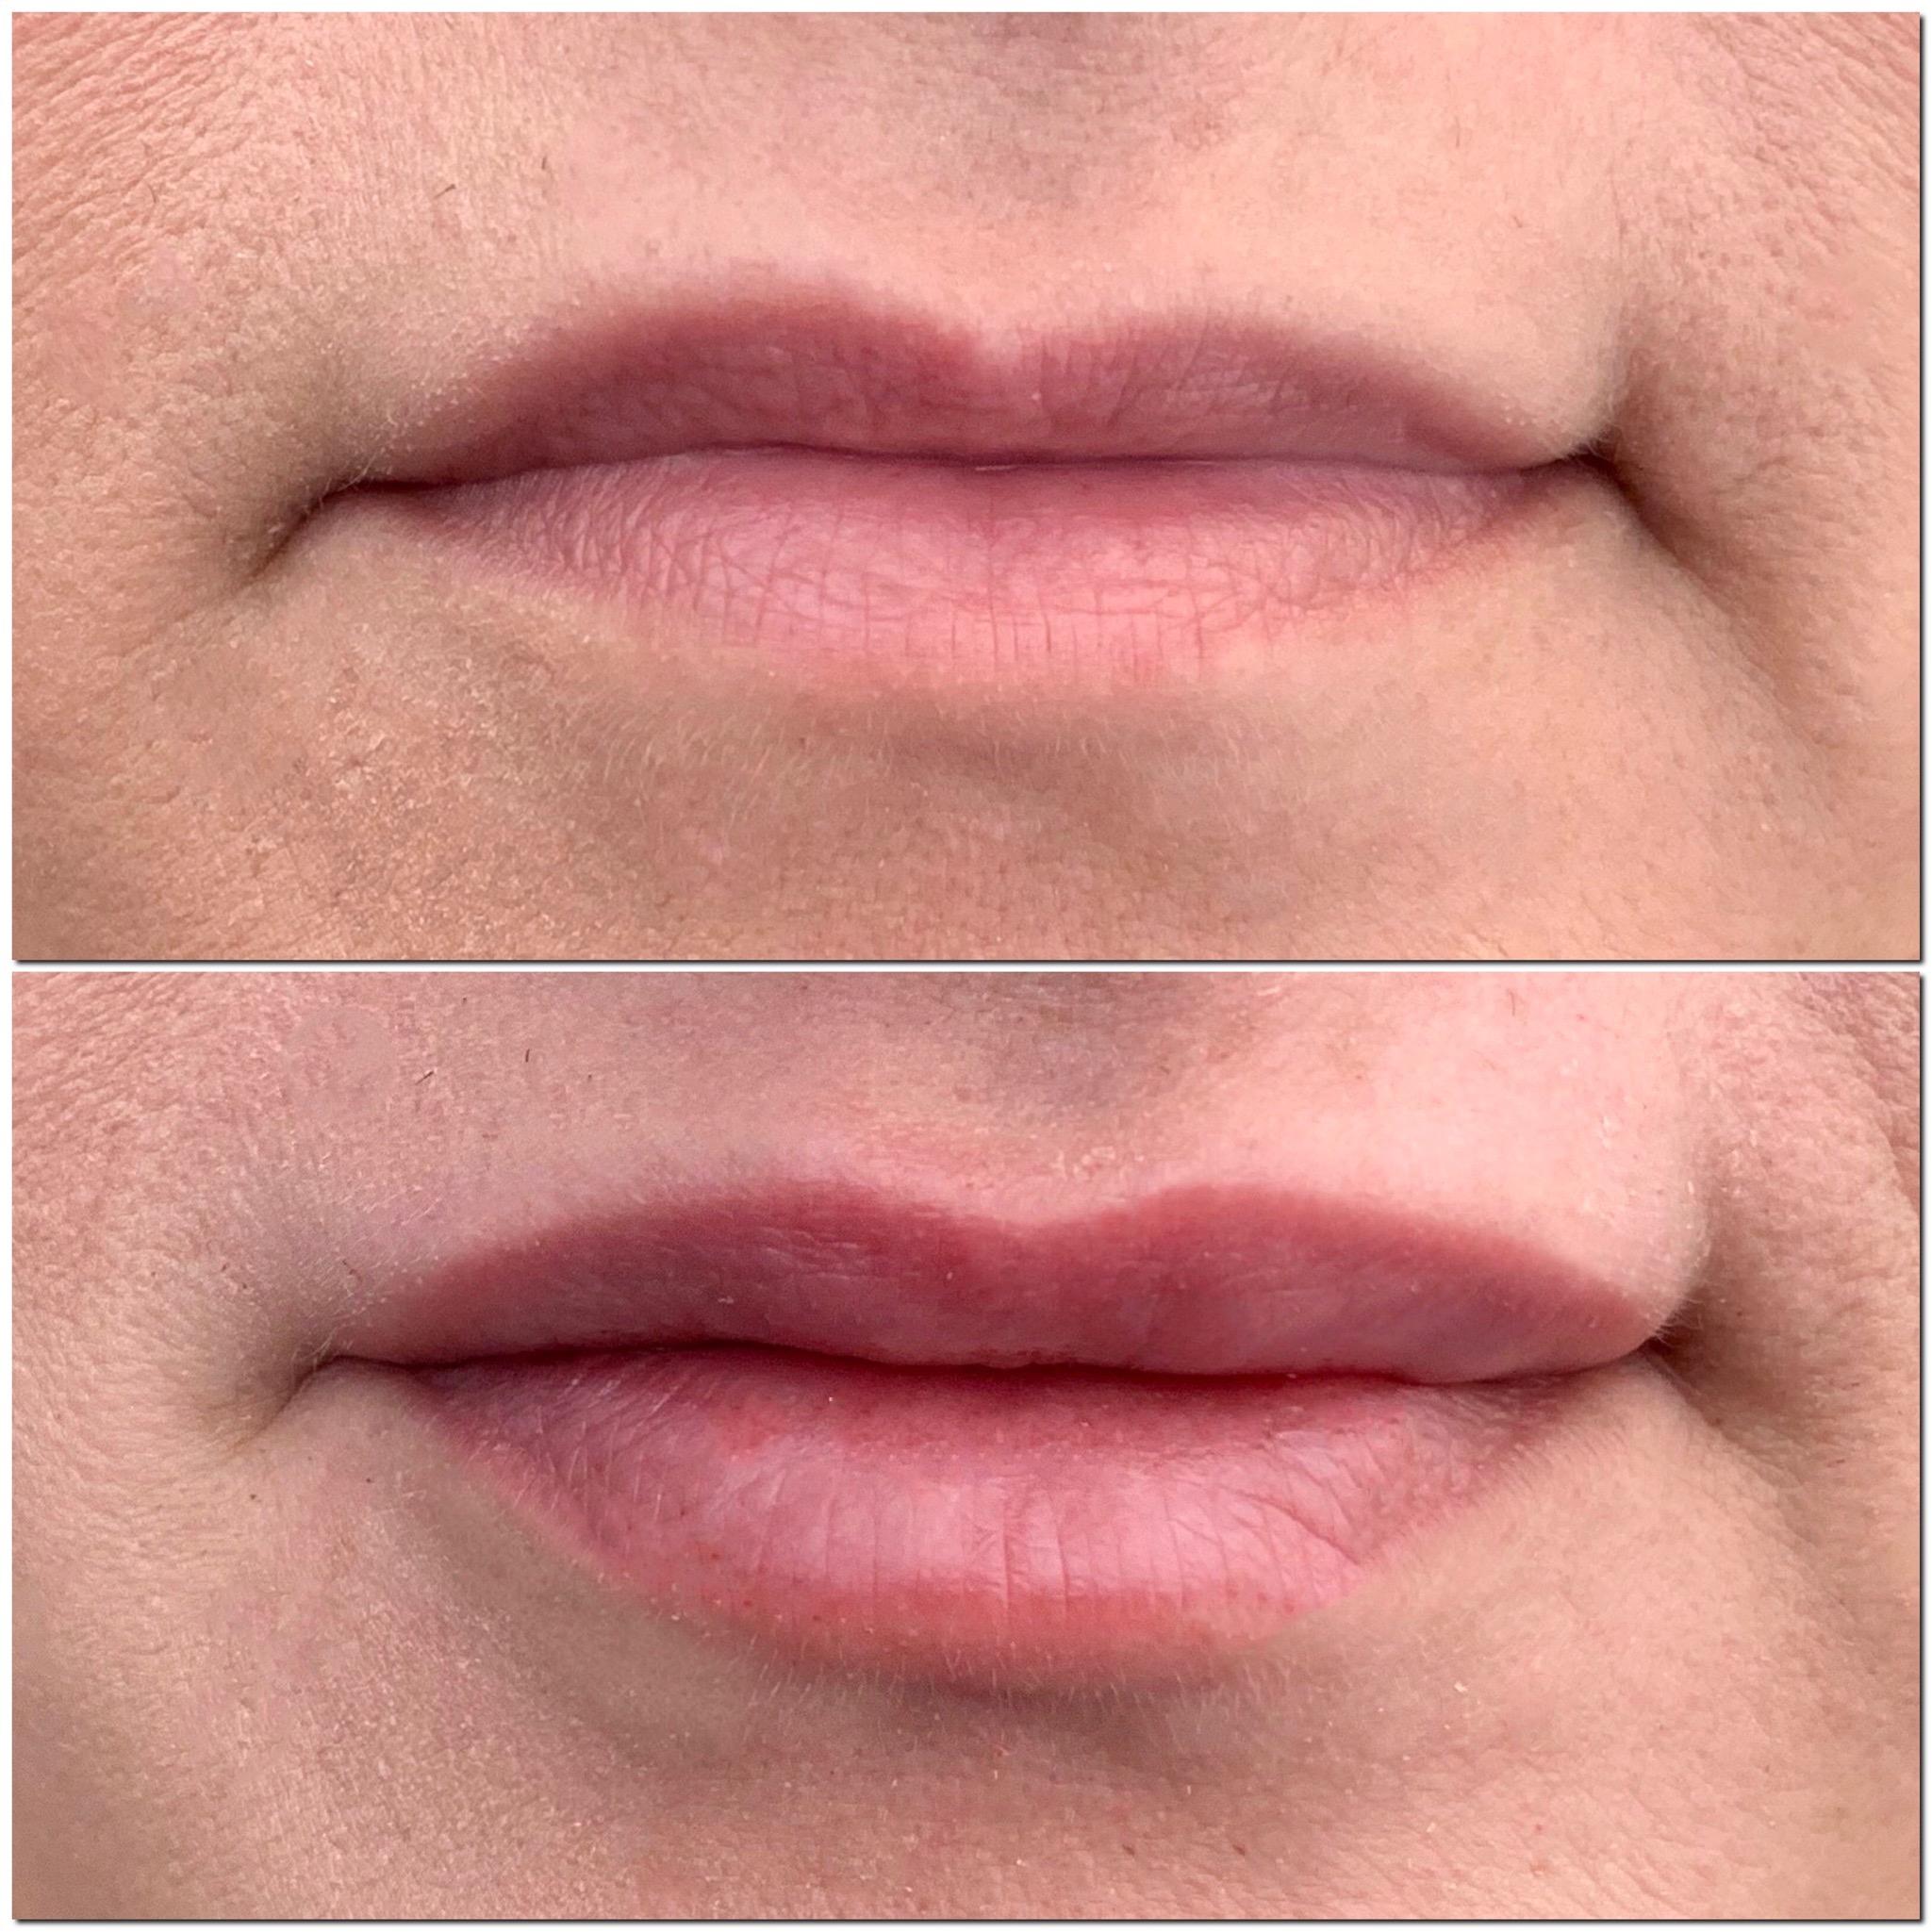 Hyaluron-Pen-Filler-Treatment-Southfield-MI-before-after